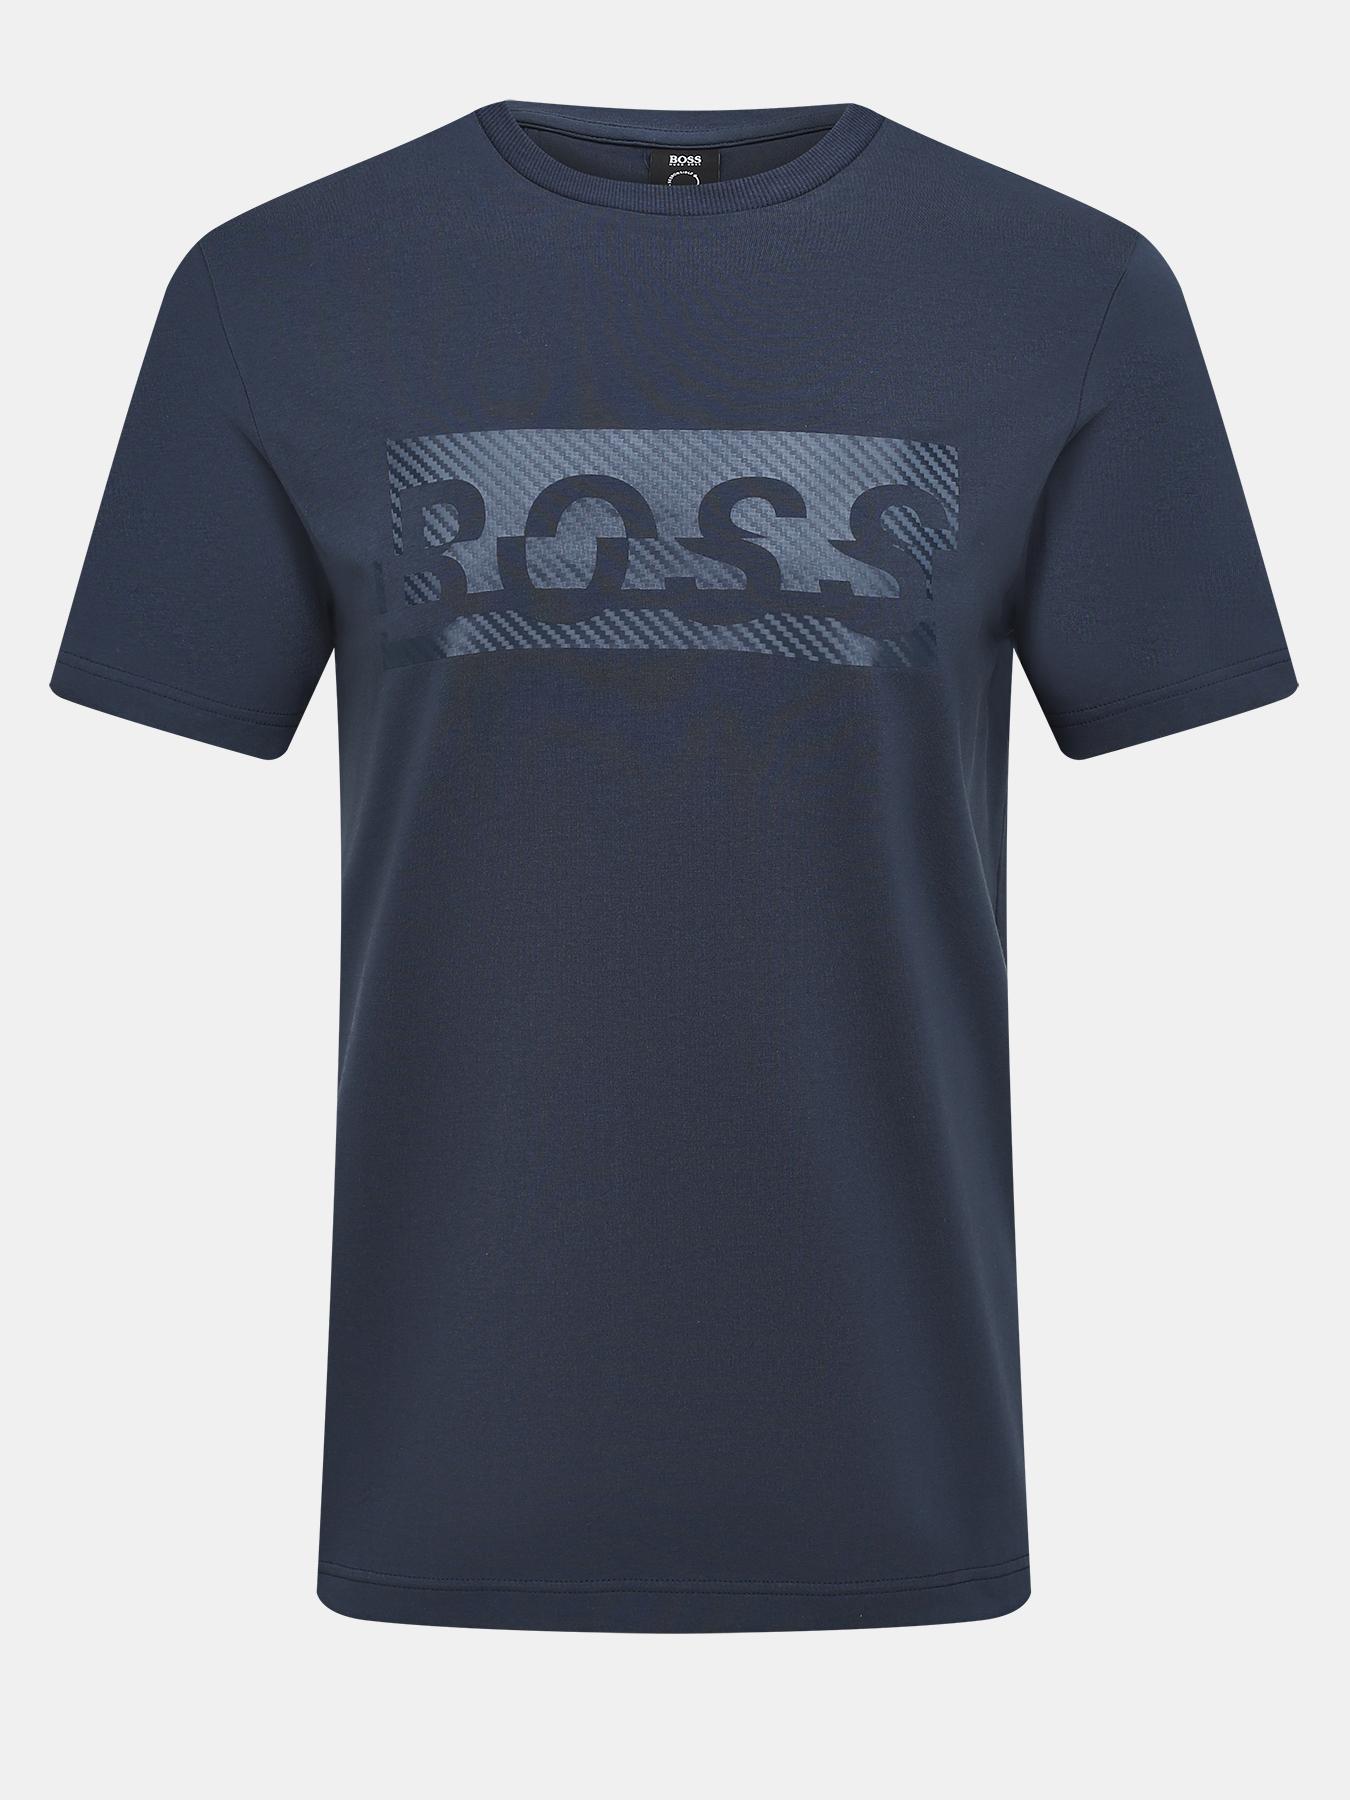 Футболки BOSS Футболка Tee футболка d grp tee 1 adidas футболка d grp tee 1